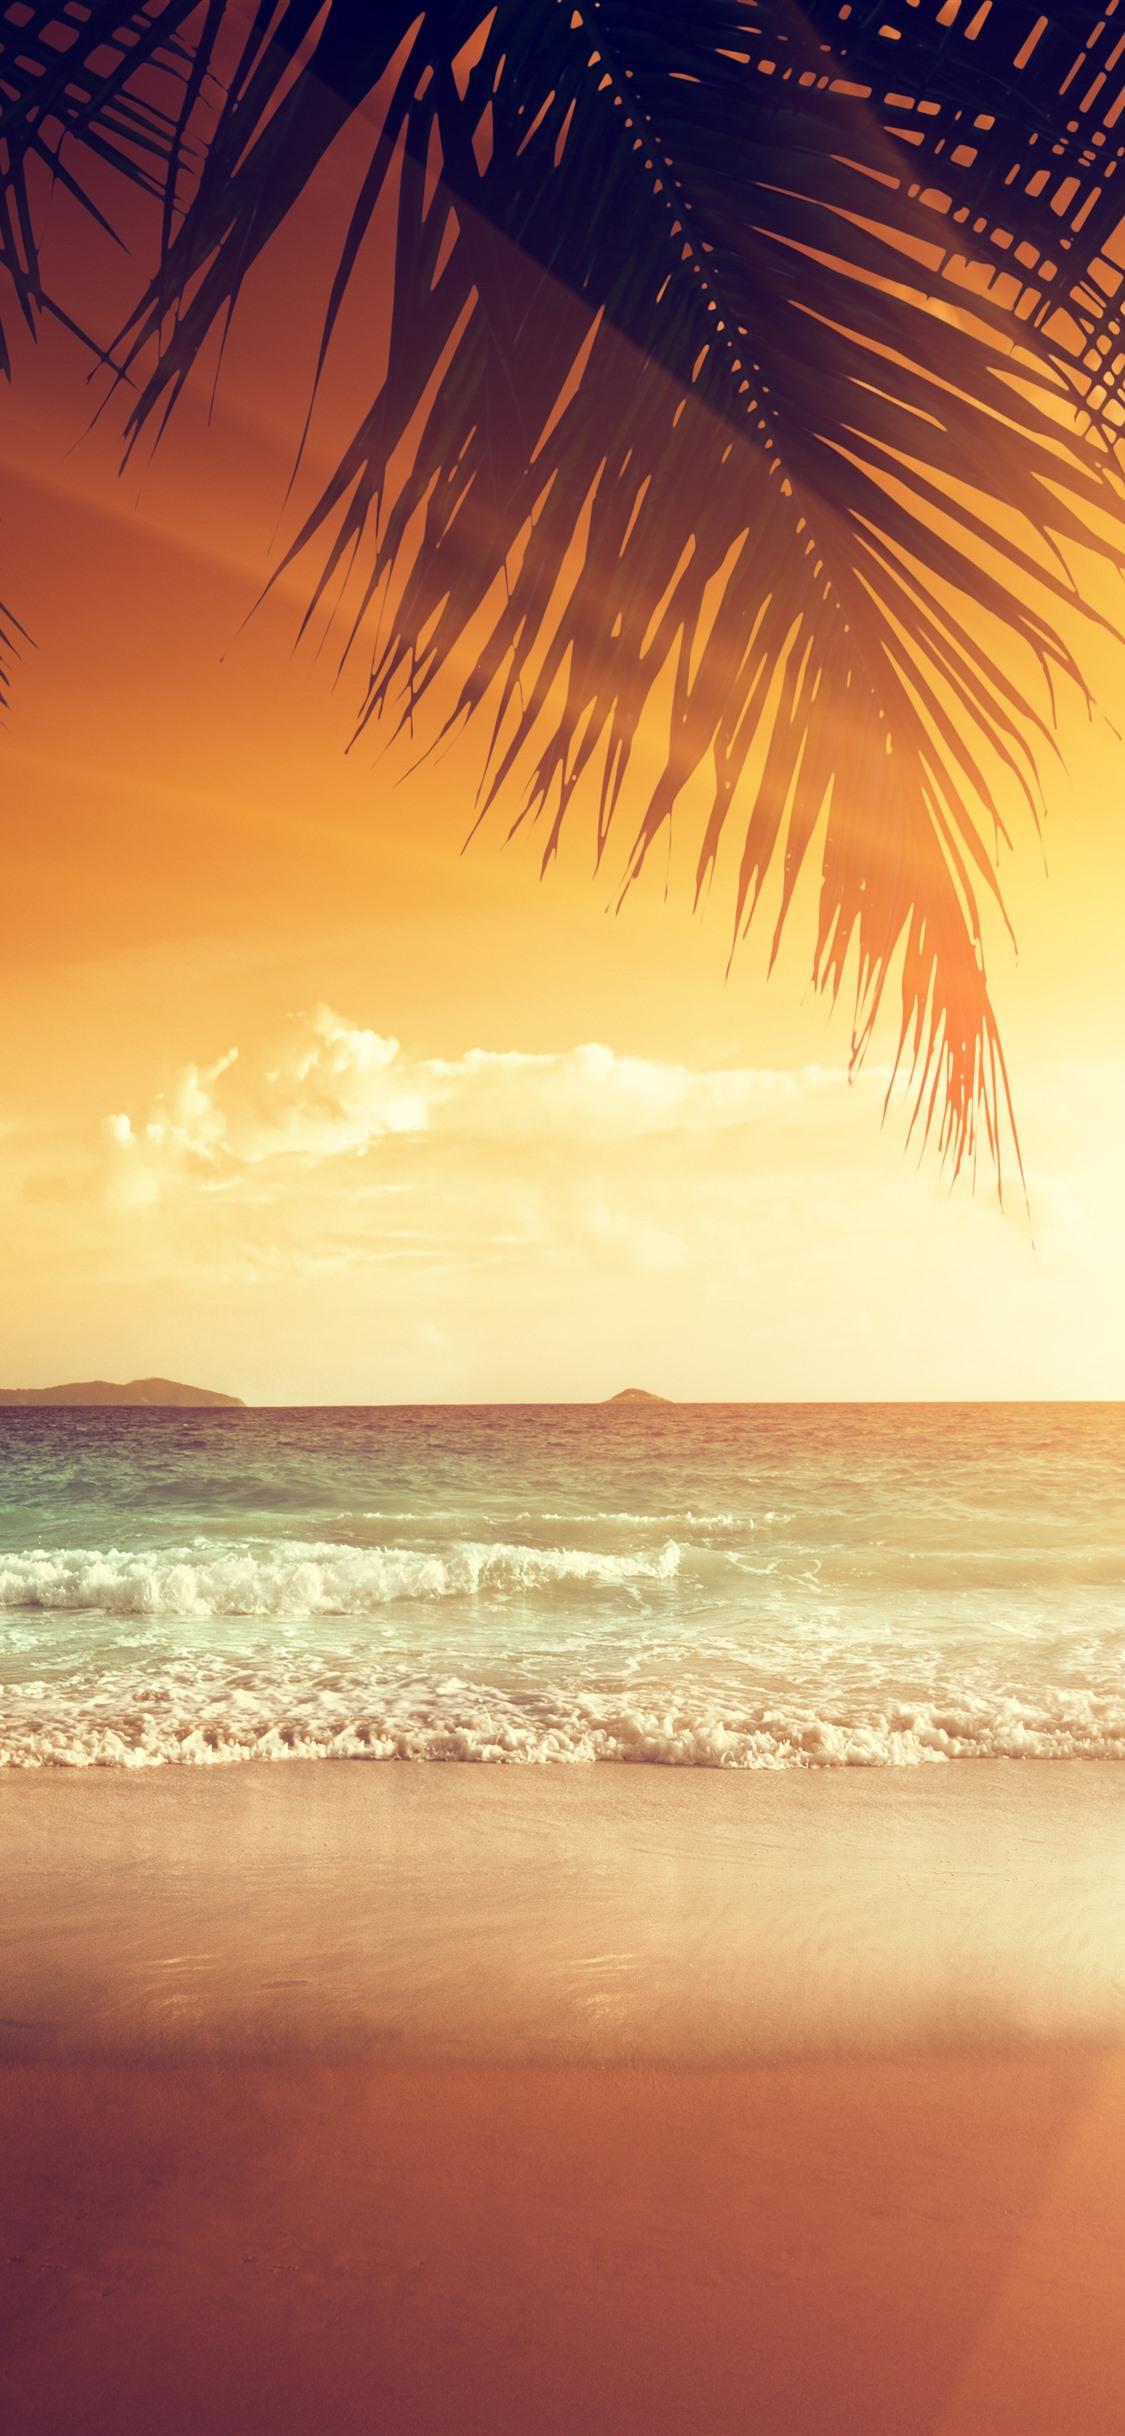 Beautiful Sunset Palm Tree Leaves Beach Sea Tropical Summer